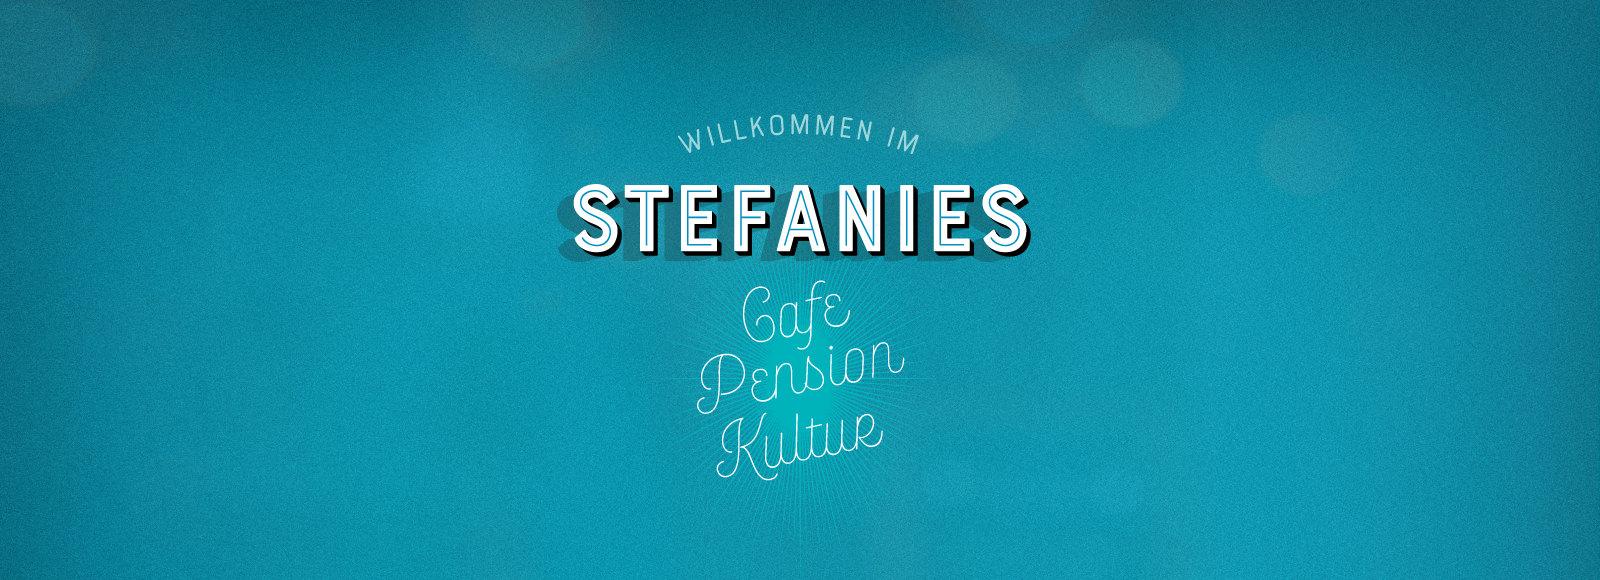 Stefanies Cafe Bad Feilnbach